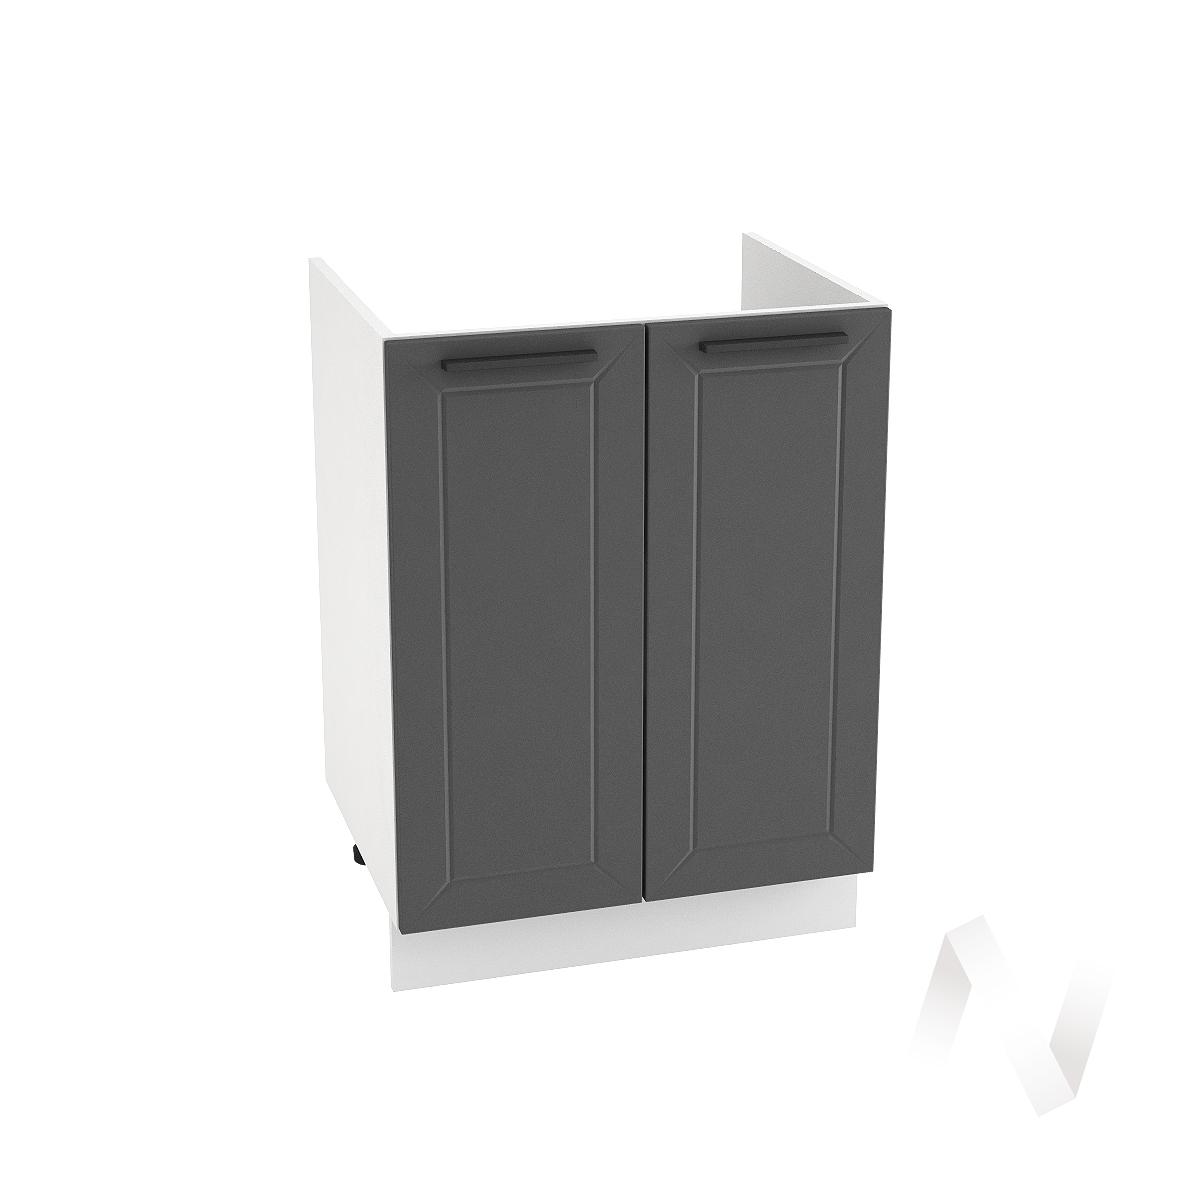 "Кухня ""Глетчер"": Шкаф нижний под мойку 600, ШНМ 600 новый (Маренго силк/корпус белый)"